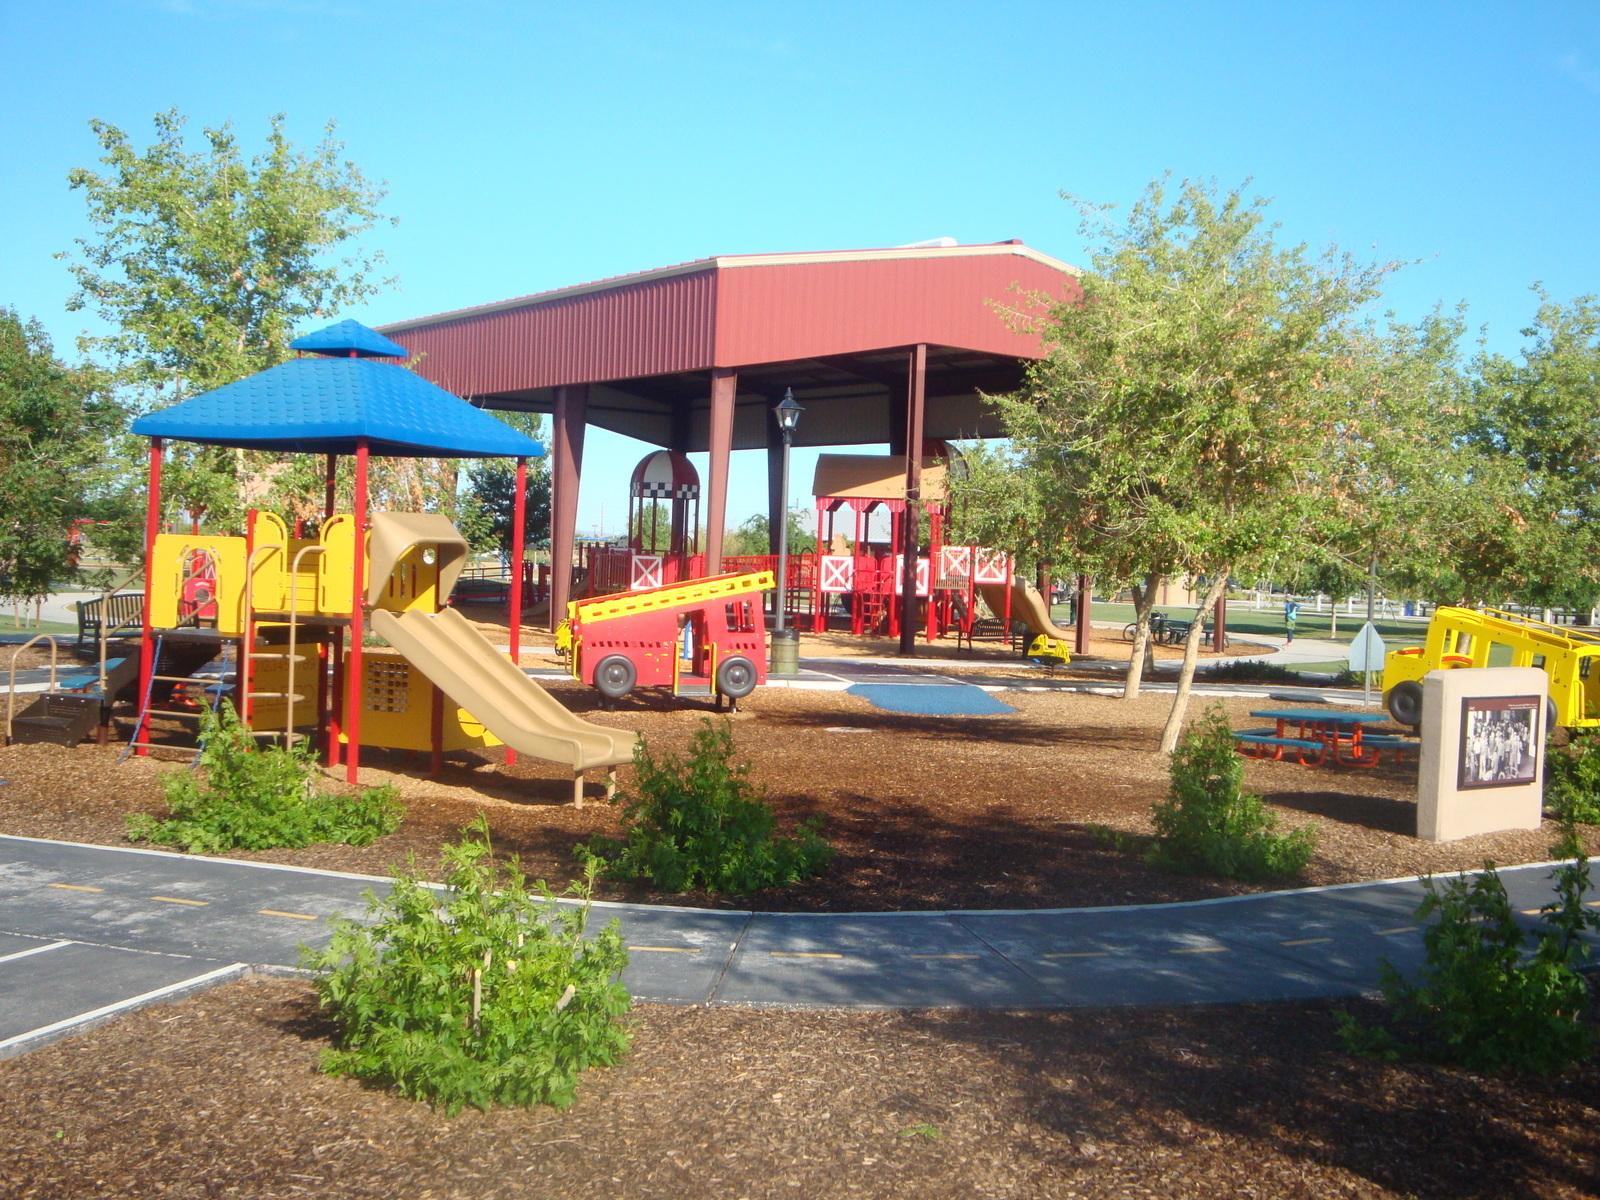 Playtopia At Tumbleweed Park In Chandler, Arizona